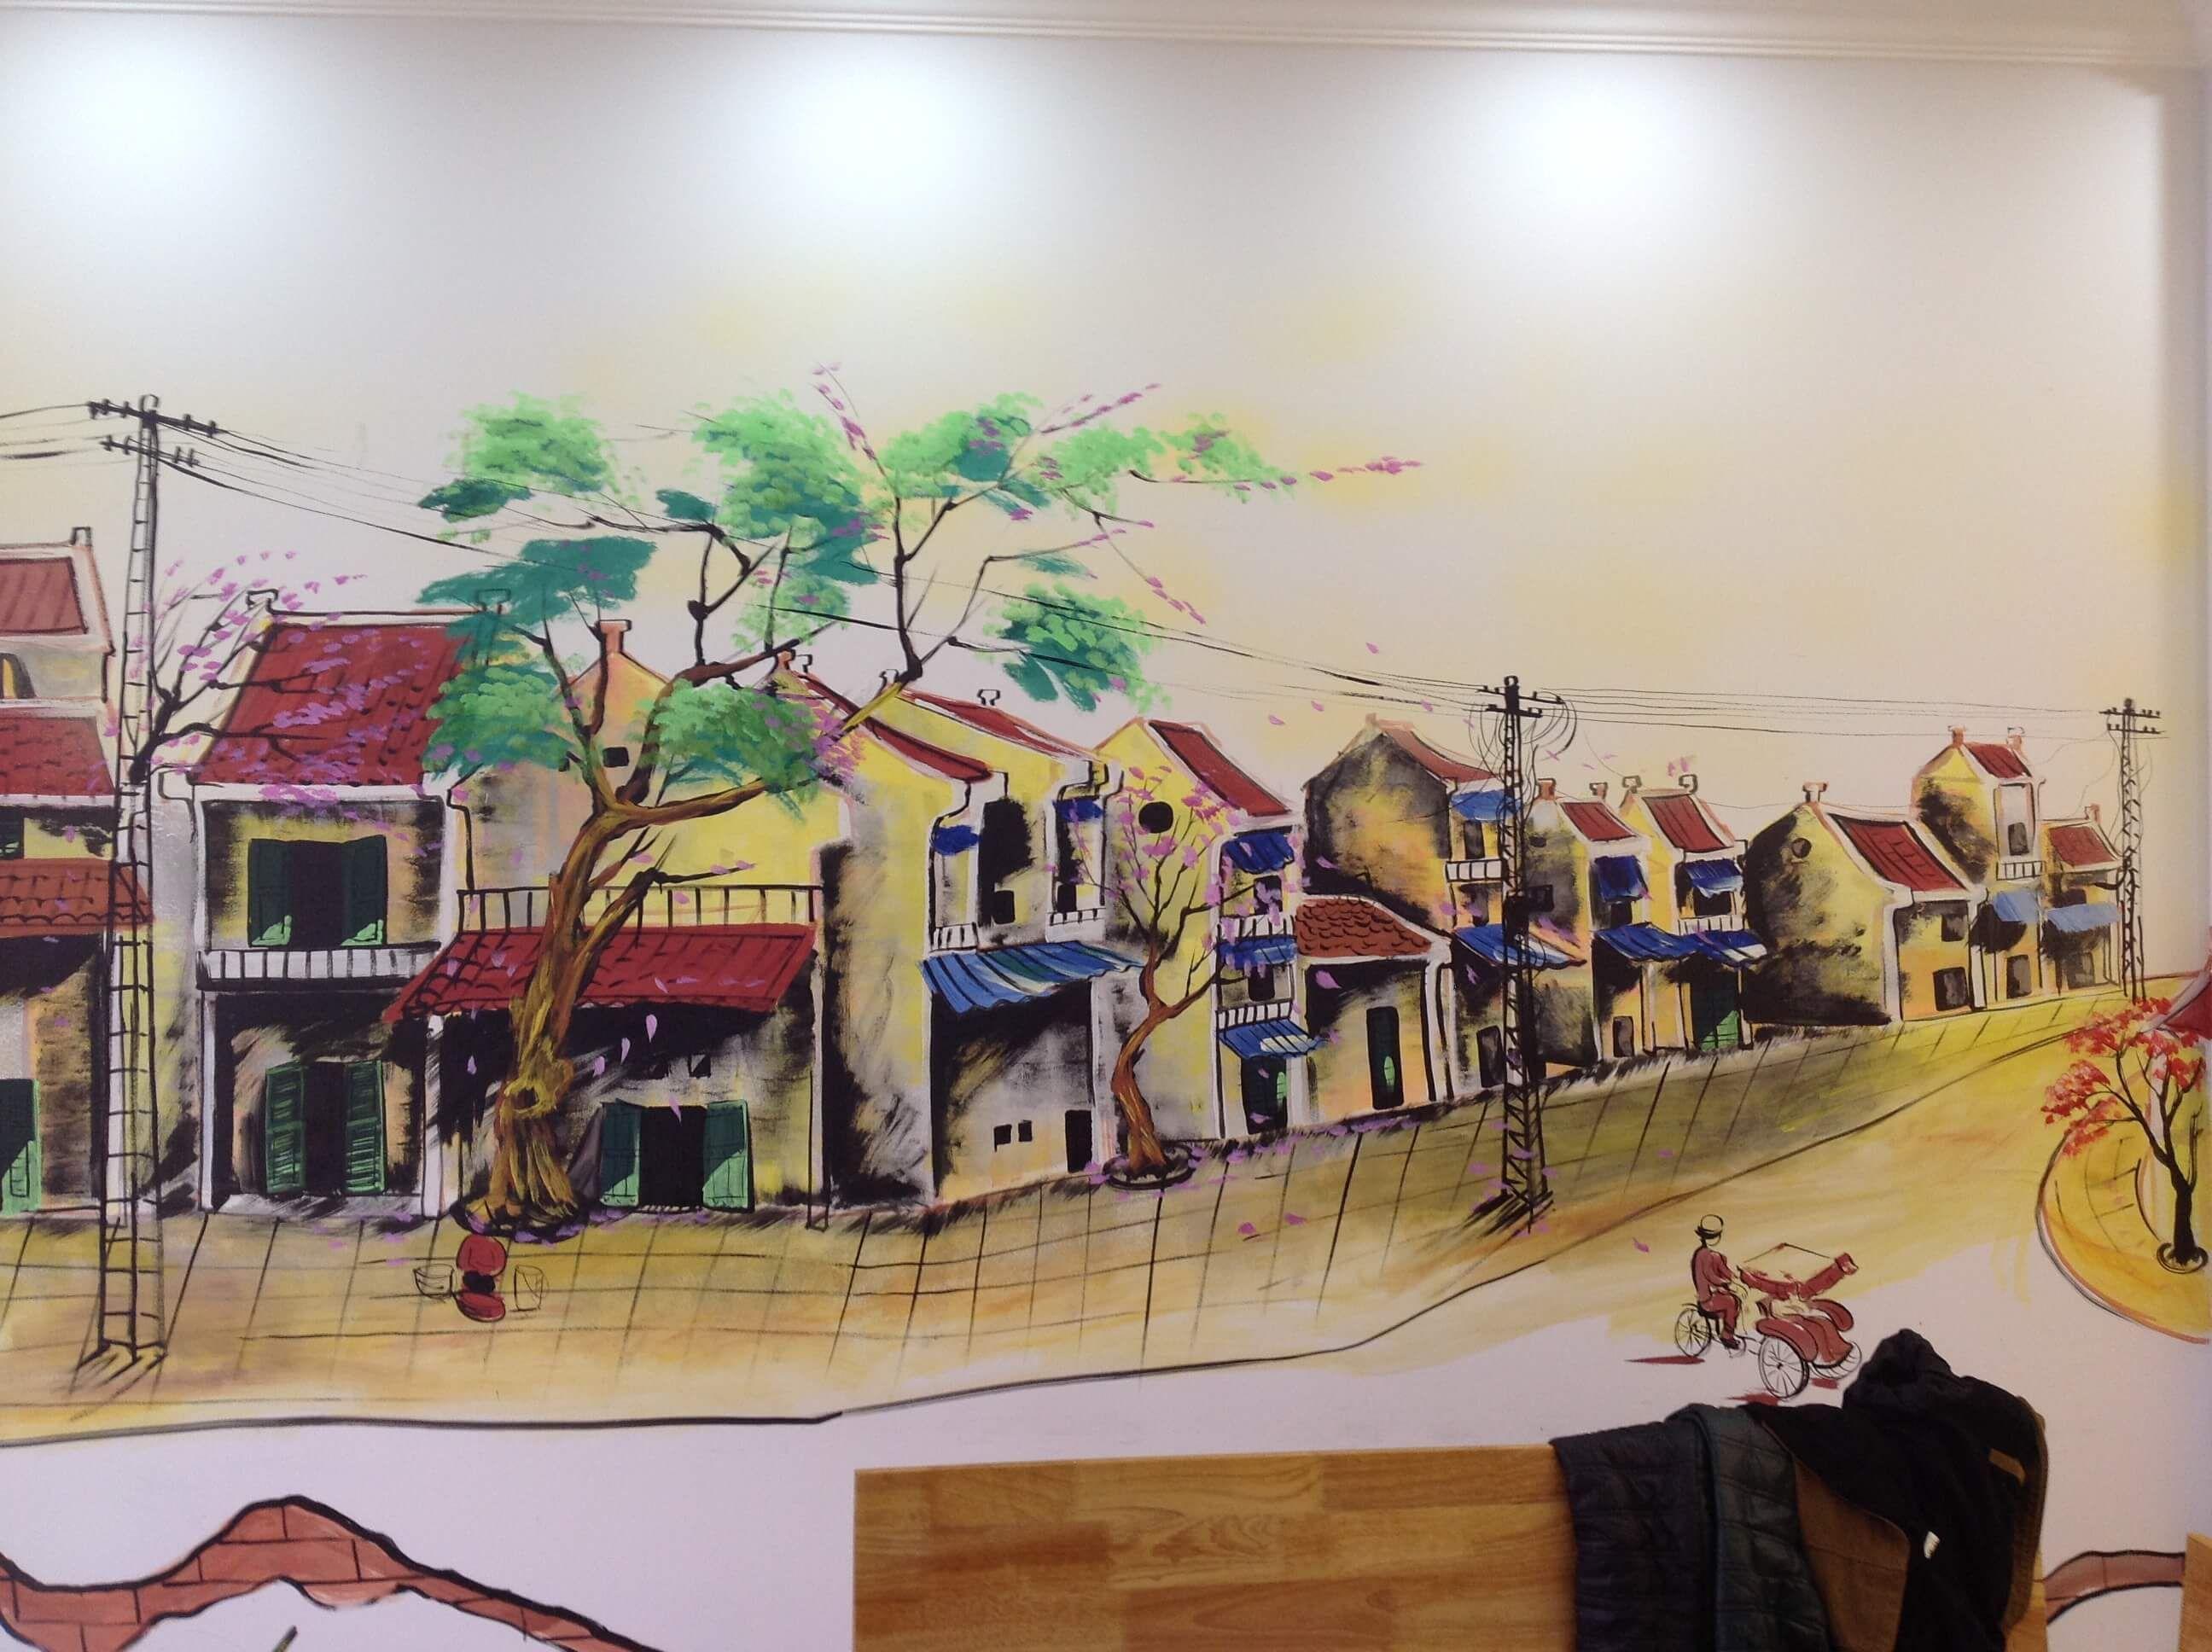 vẽ tranh tường phố cổ